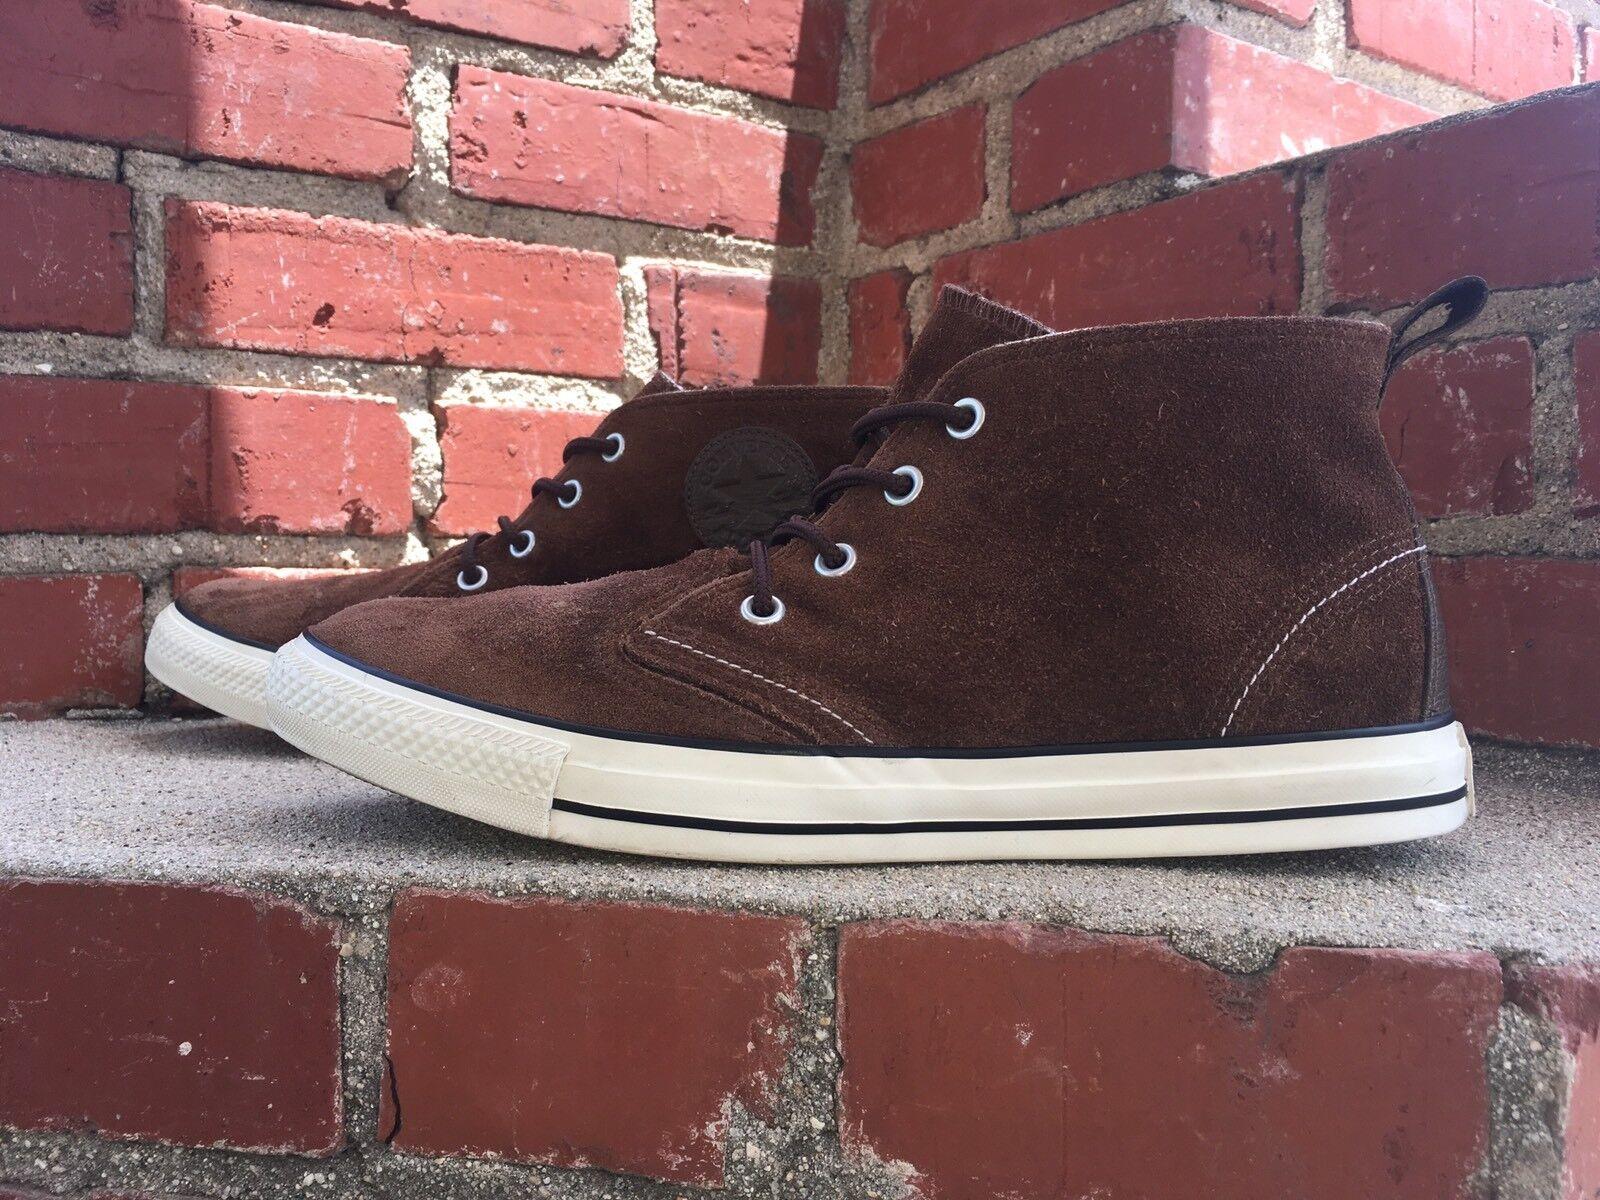 Converse Chuck Tayl All Star Berkshire Hi Sneaker 1132468c Men Sze 11.5 Wmn 13.5